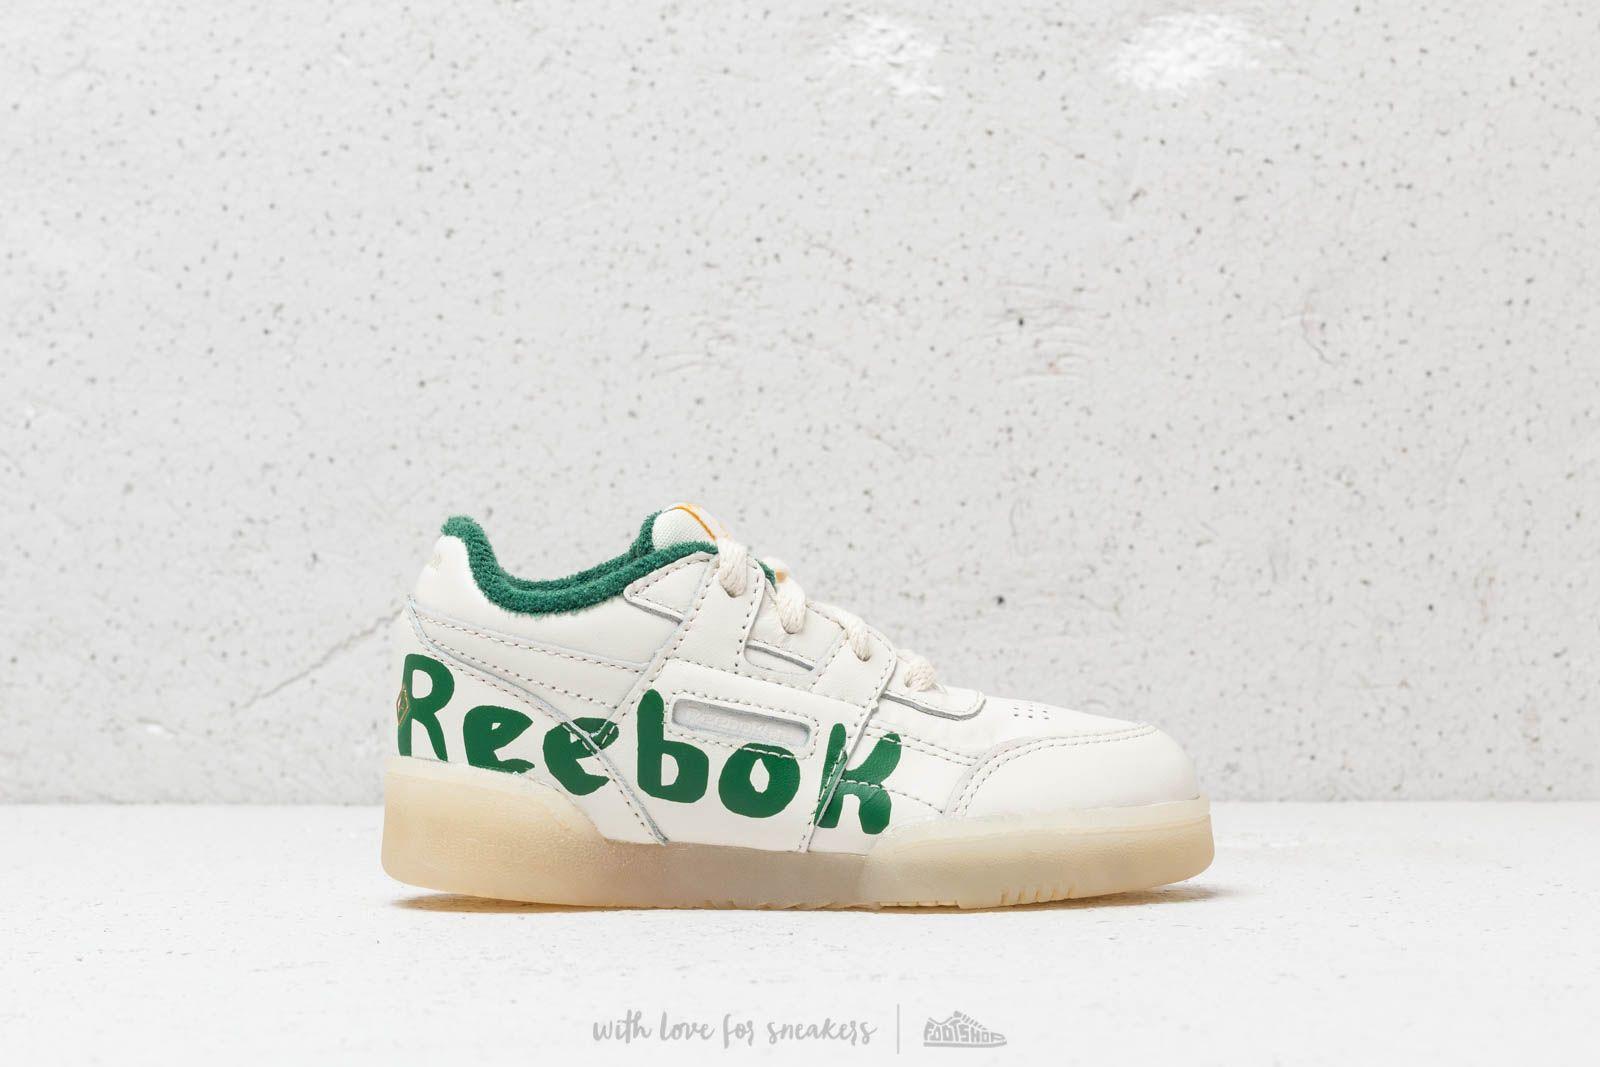 69c6c9170ff Reebok Workout Plus Tao Graphic Pristine  Amazon  Freesla at a great price  £41